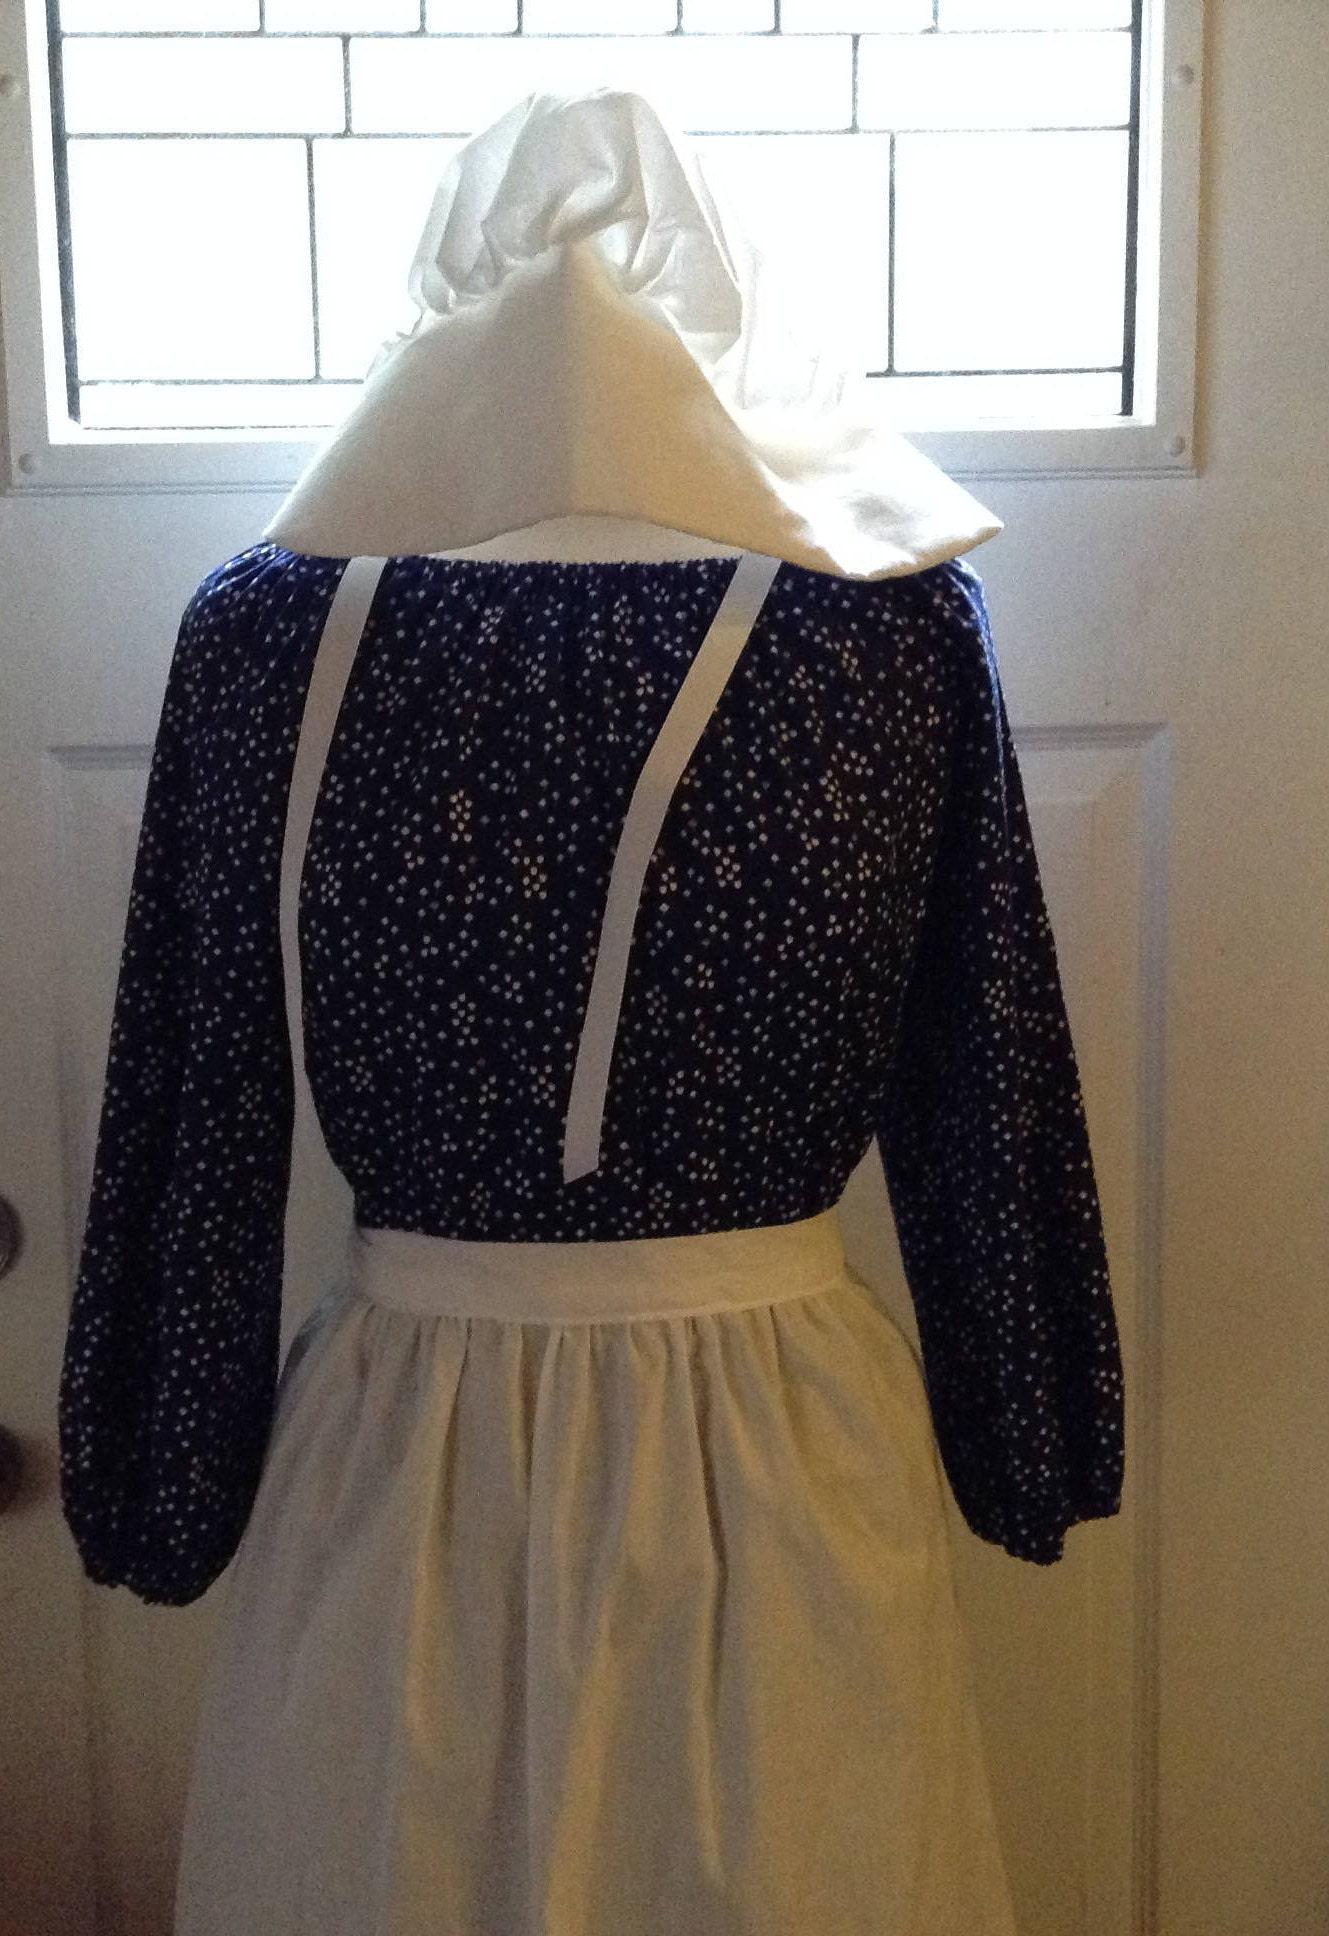 Pioneer Trek Clothing Civil War Dress Ready To Ship Girls Colonial